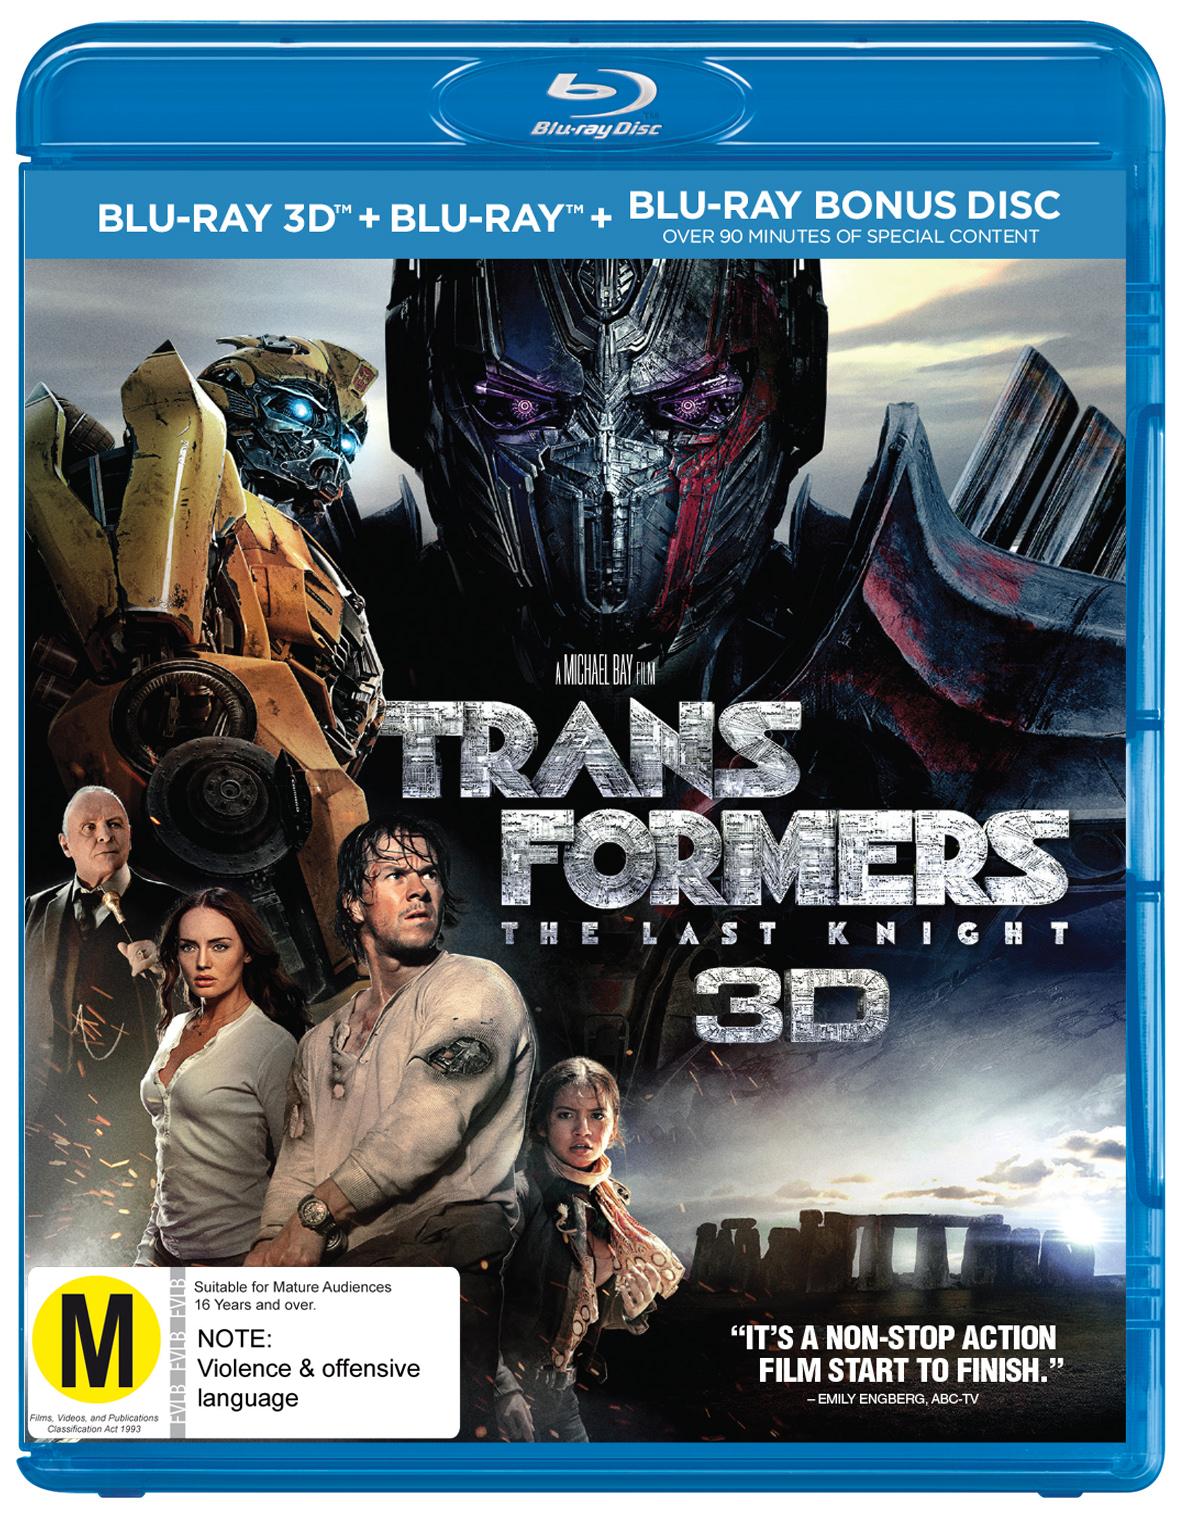 Transformers: The Last Knight on Blu-ray, 3D Blu-ray image